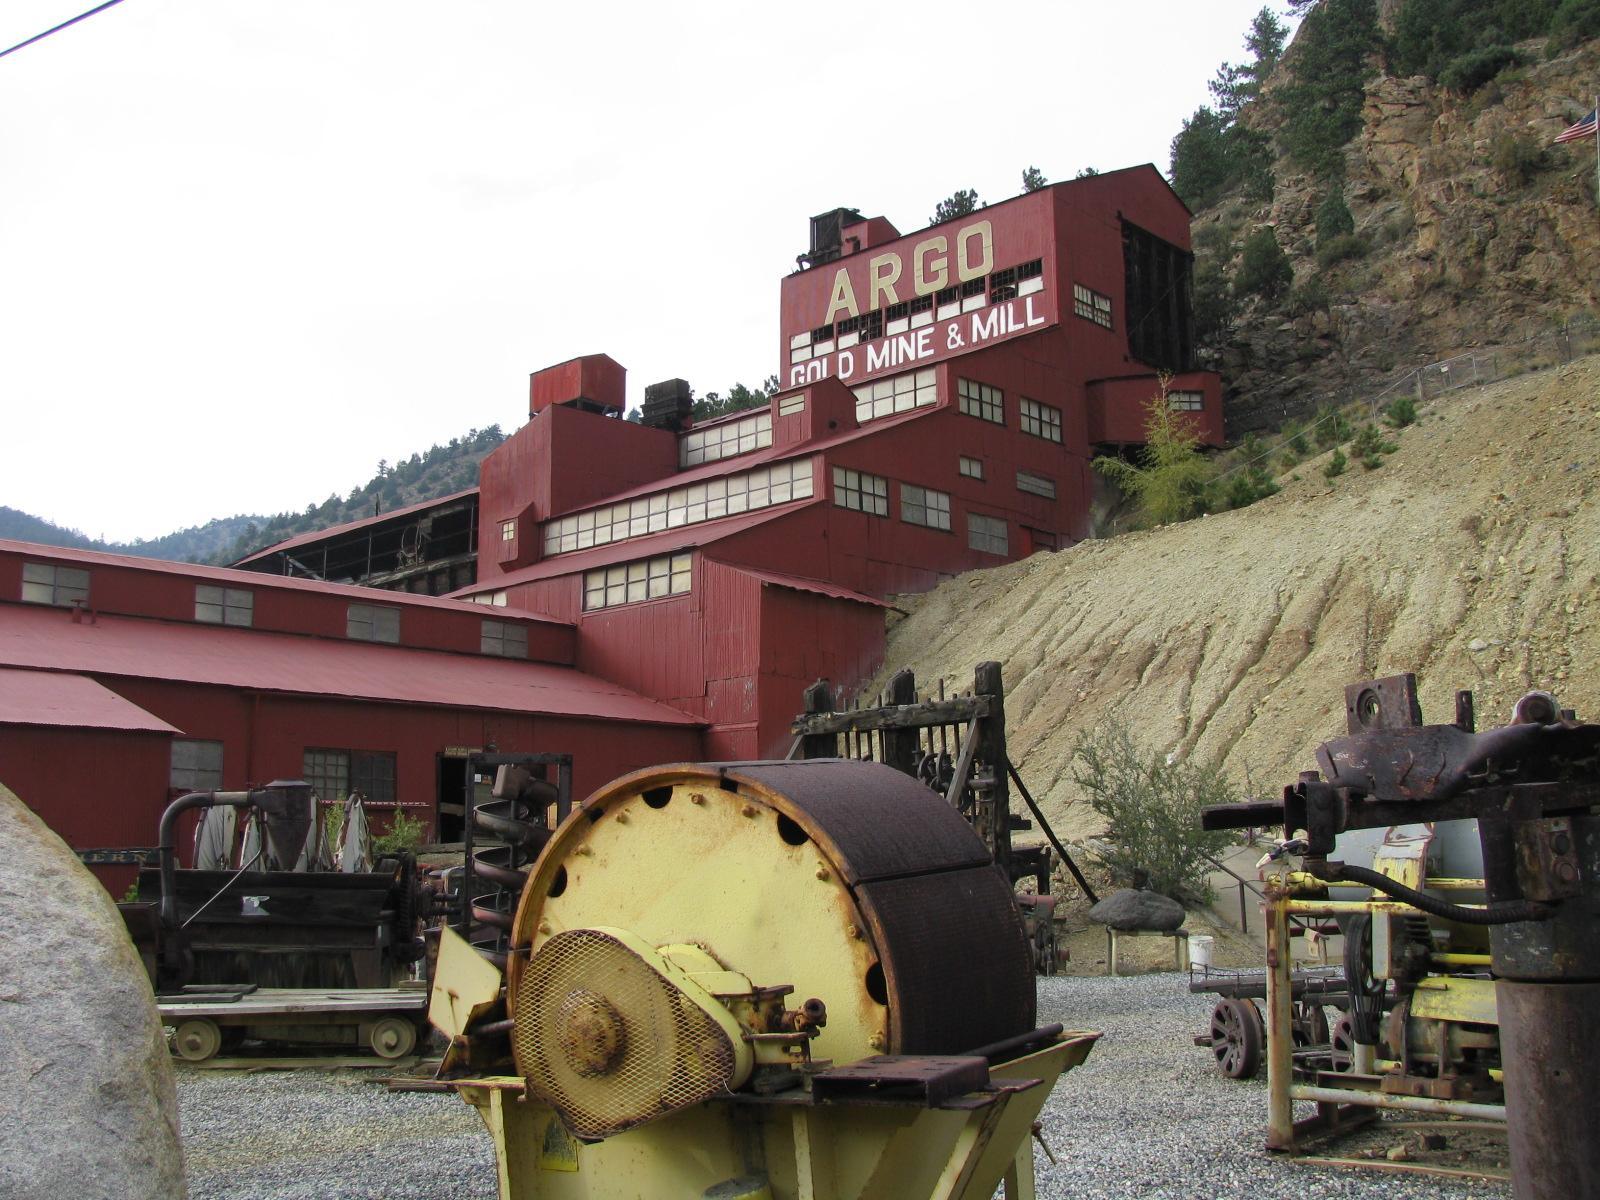 Argo Mine, Idaho Springs